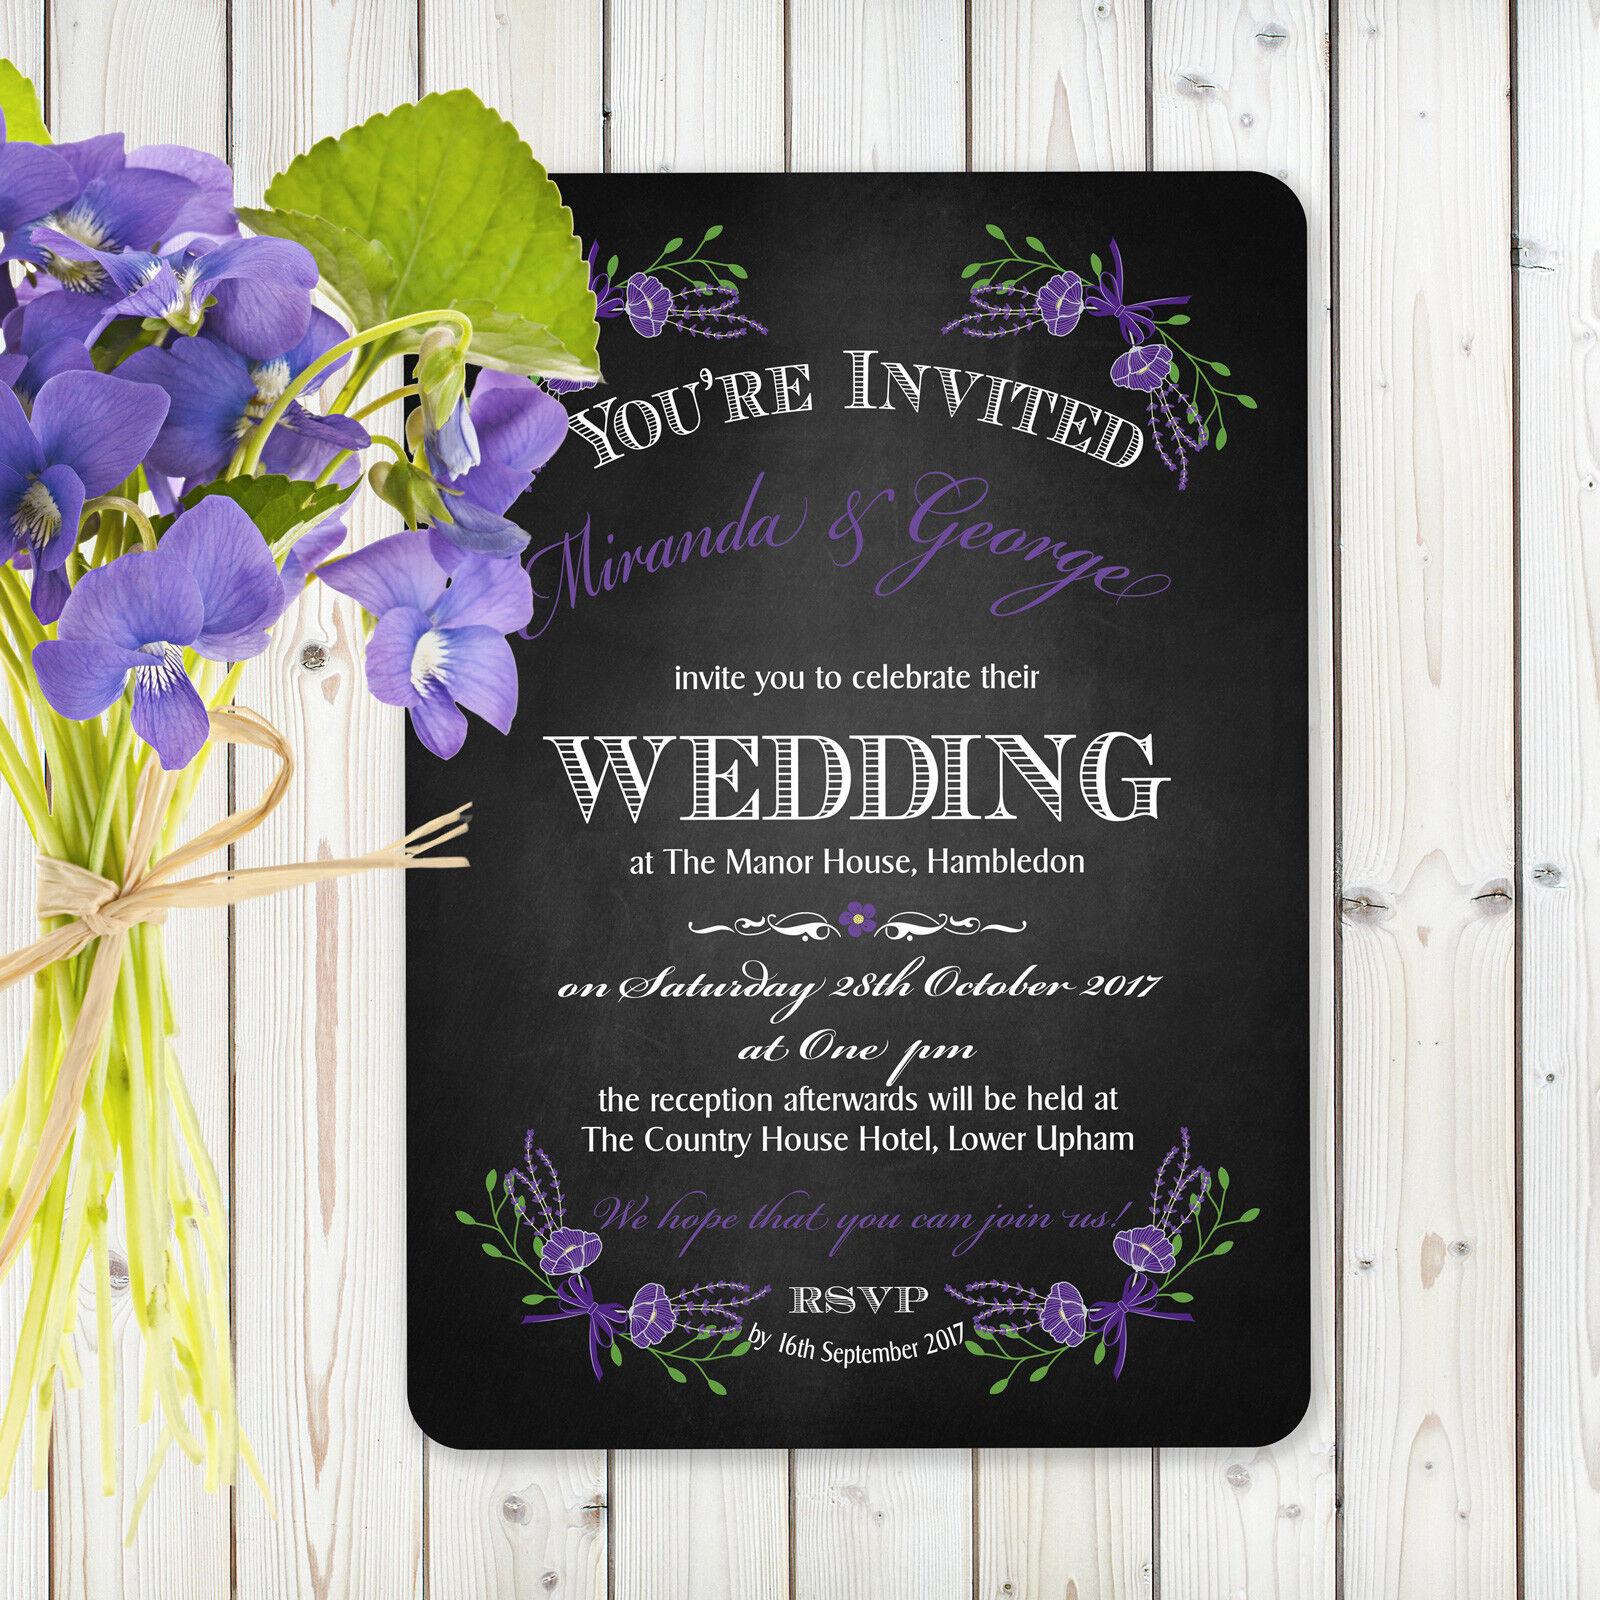 Personnalisé Vintage Floral Wedding Invitation Fantasy Floral Vintage Violet Inc Enveloppe Noir 7bf1e6